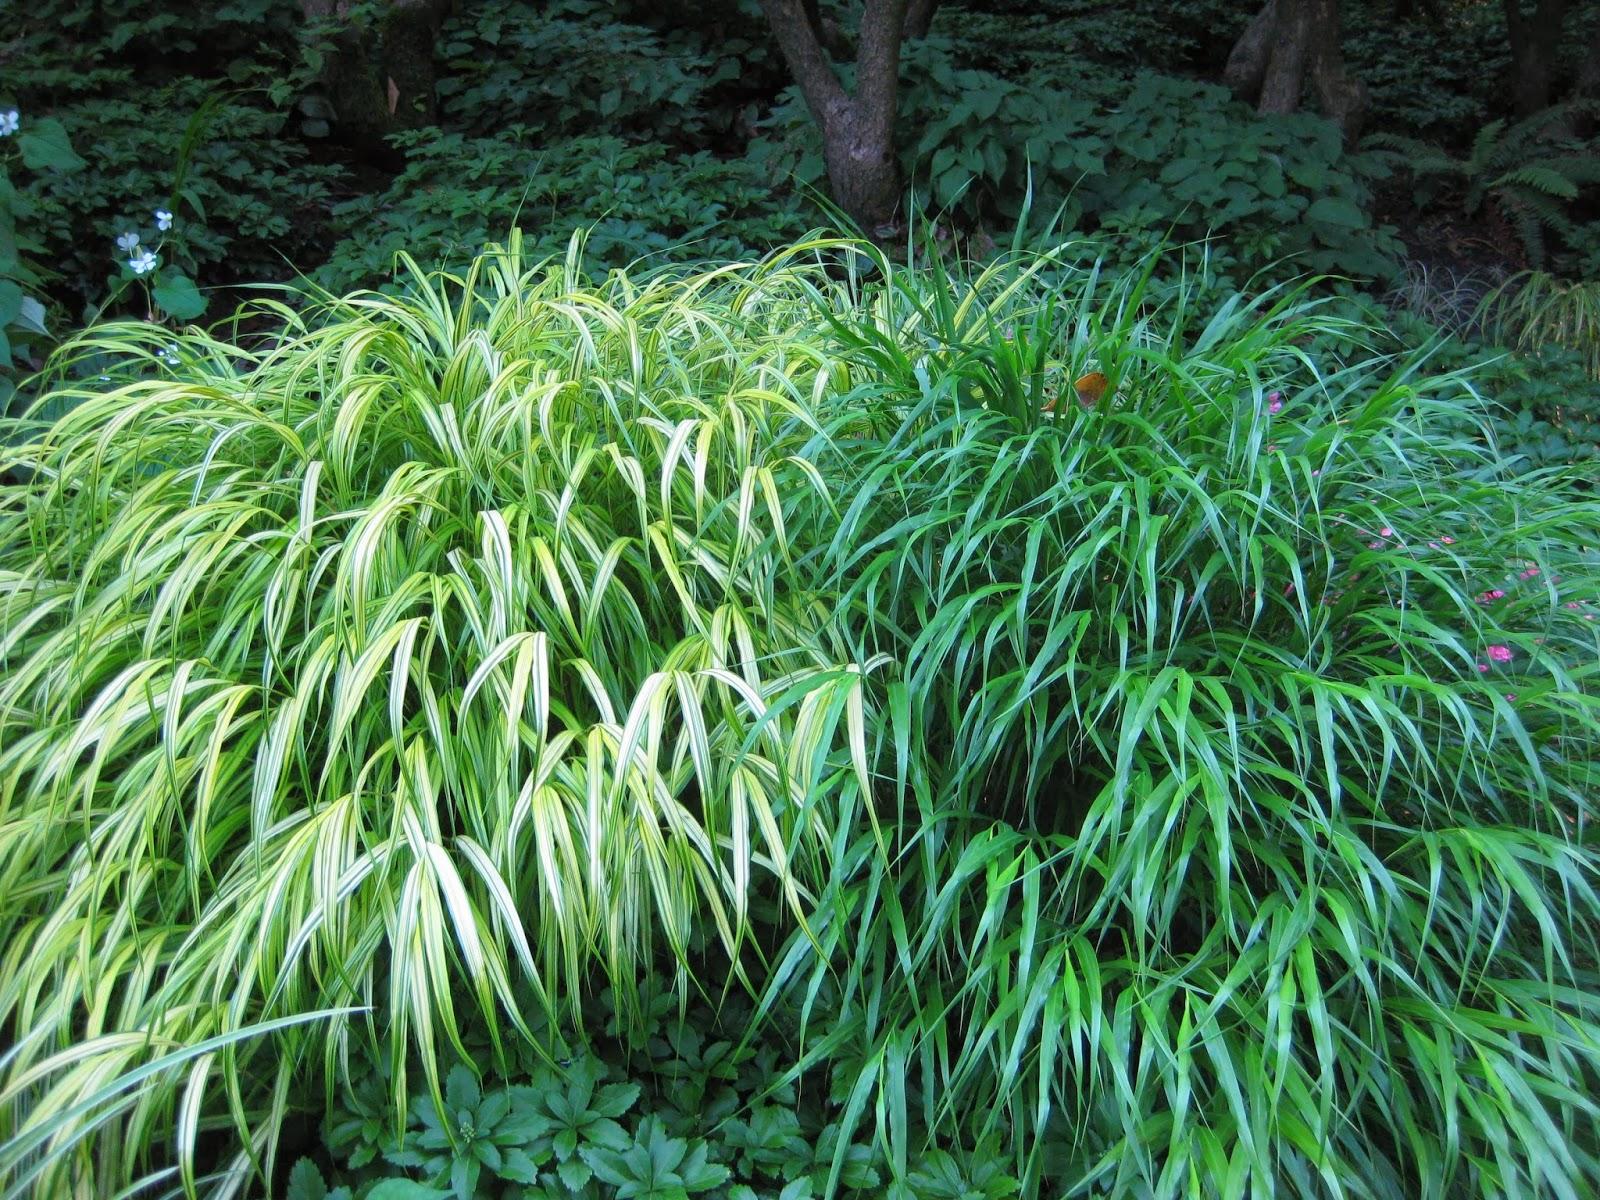 Rotary botanical gardens hort blog hakone grass a for Japanese grass